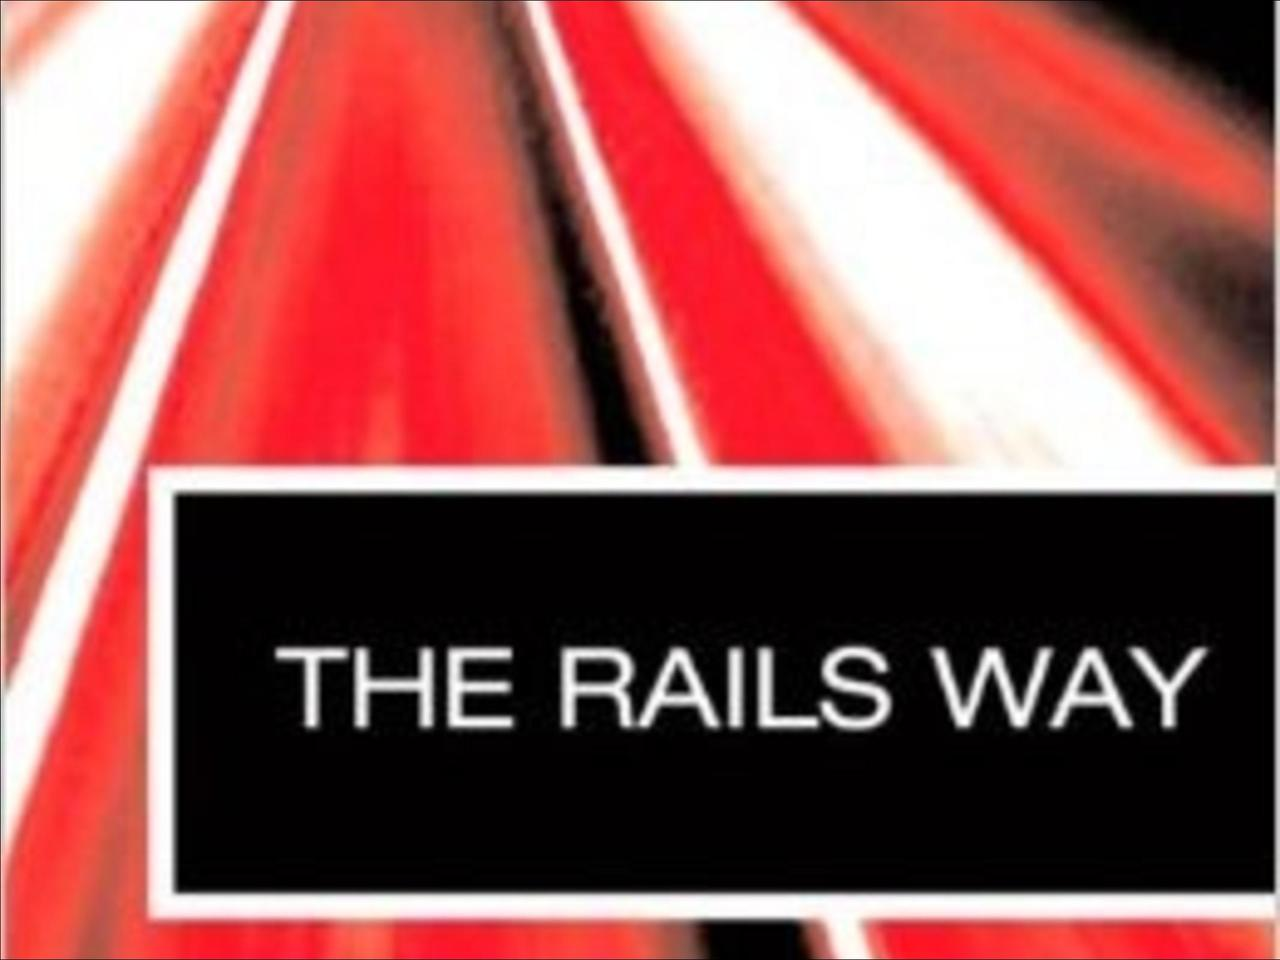 Life Beyond Rails